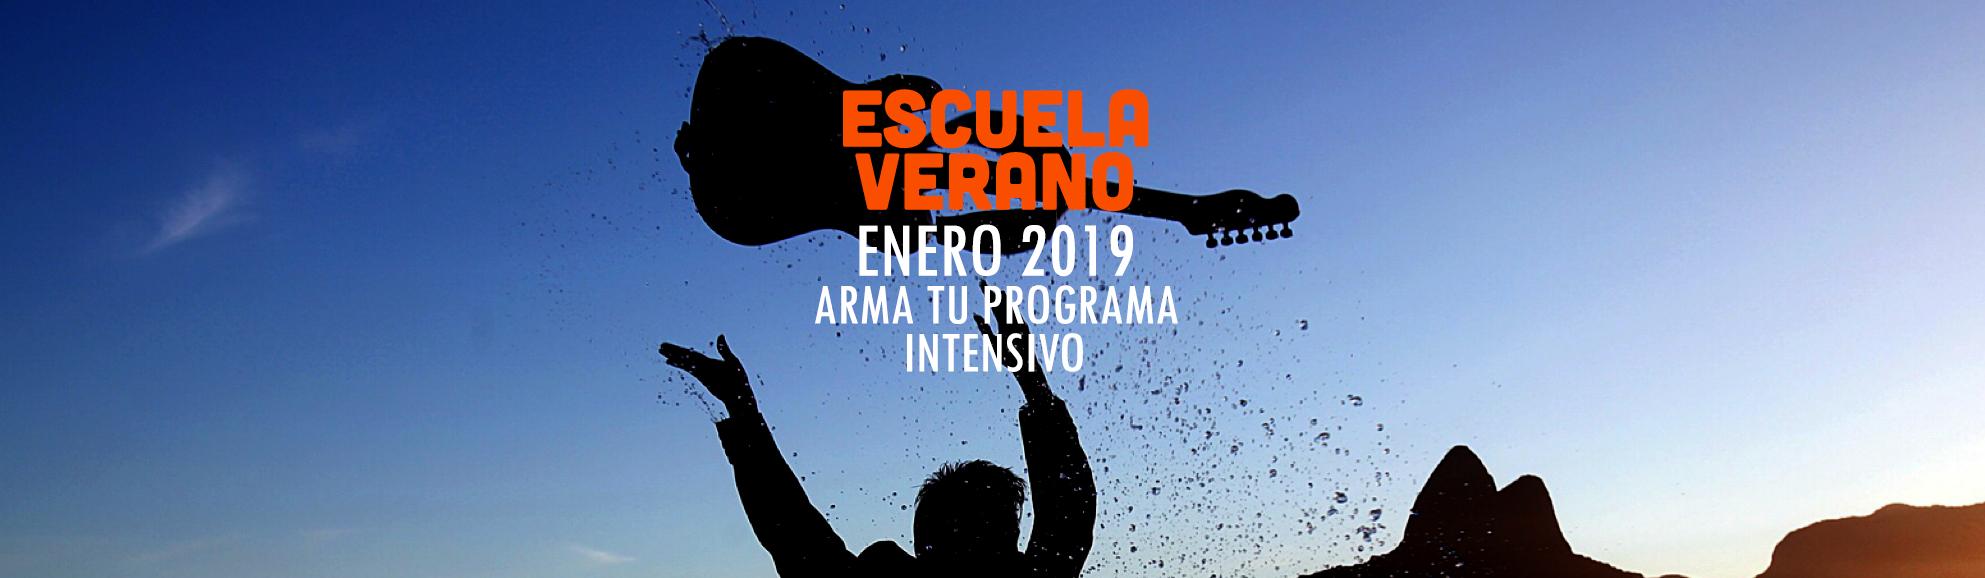 slide verano 2019